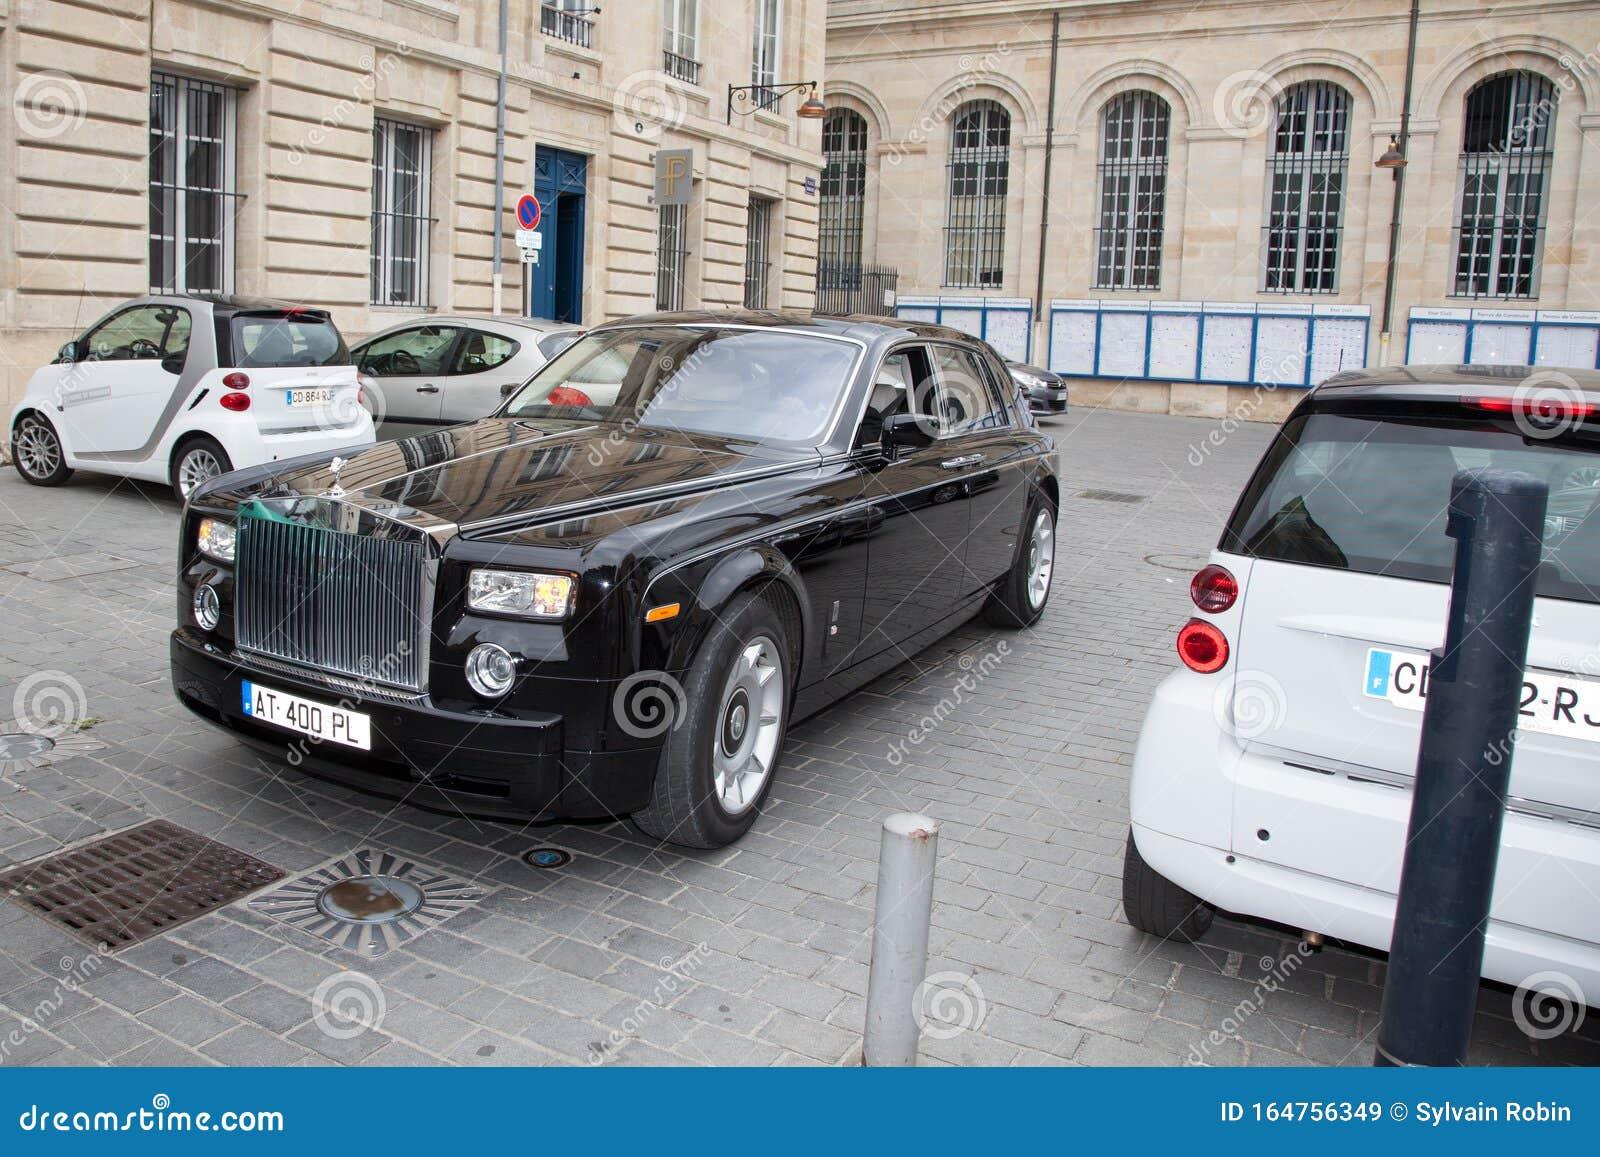 Bordeaux Aquitaine France 11 07 2019 Rolls Royce Phantom Black Luxury Car Beside Small Smart Car Editorial Stock Image Image Of Ghost Phantom 164756349